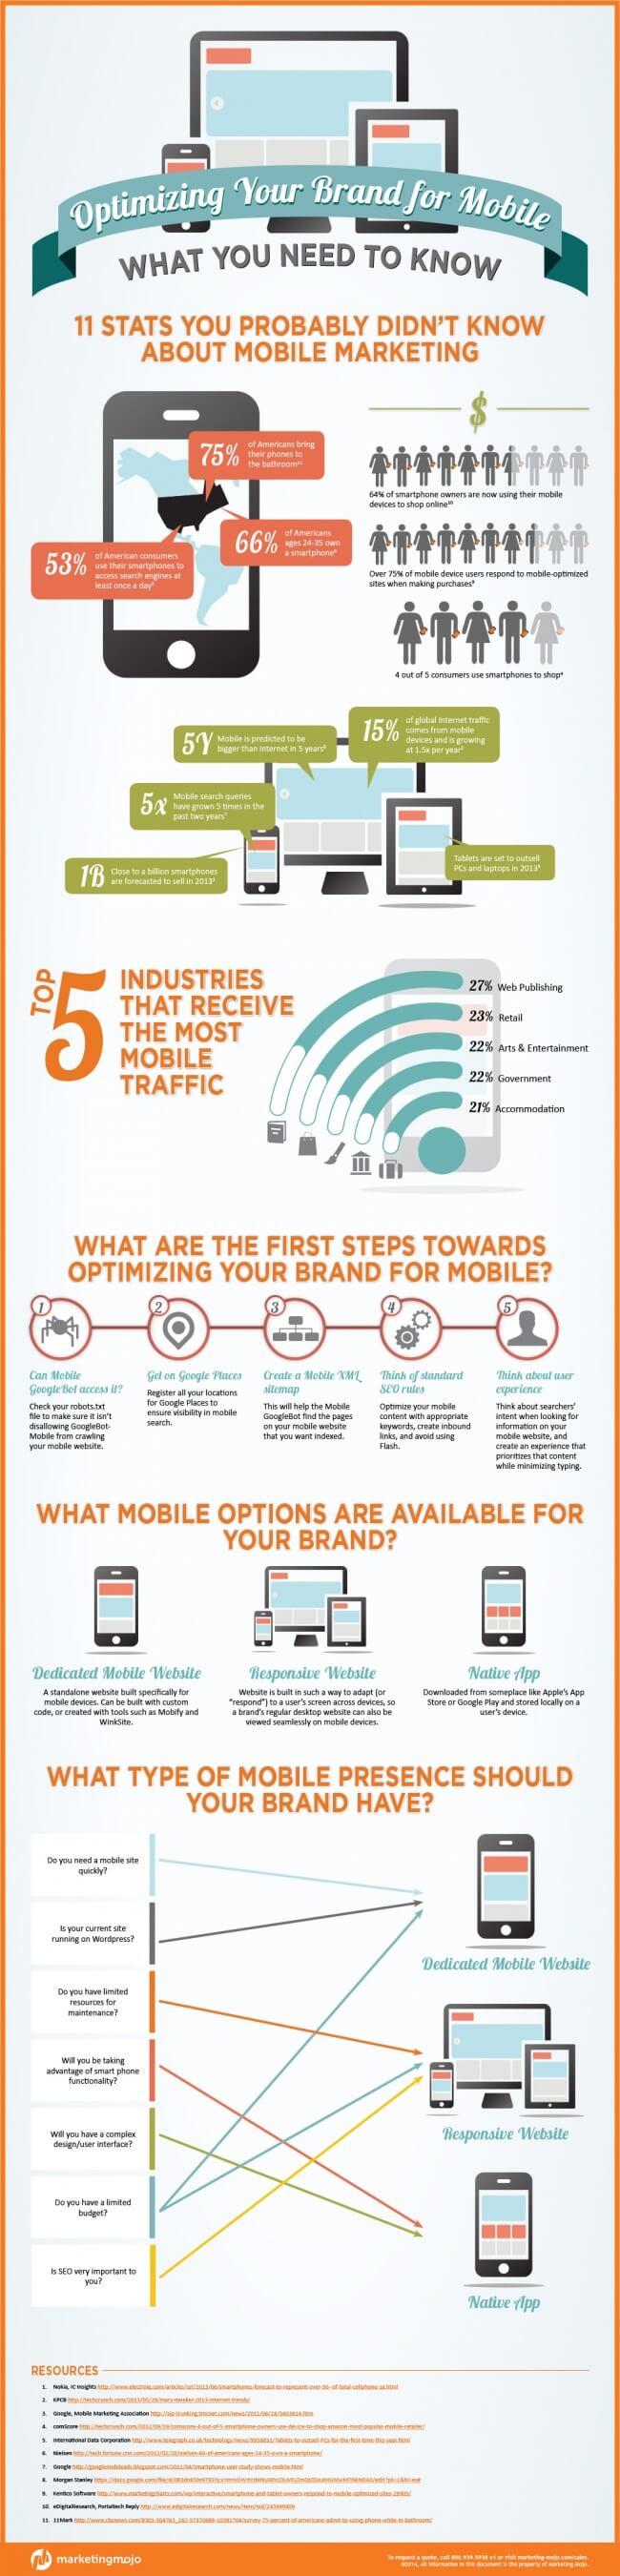 mobile marketing optimization